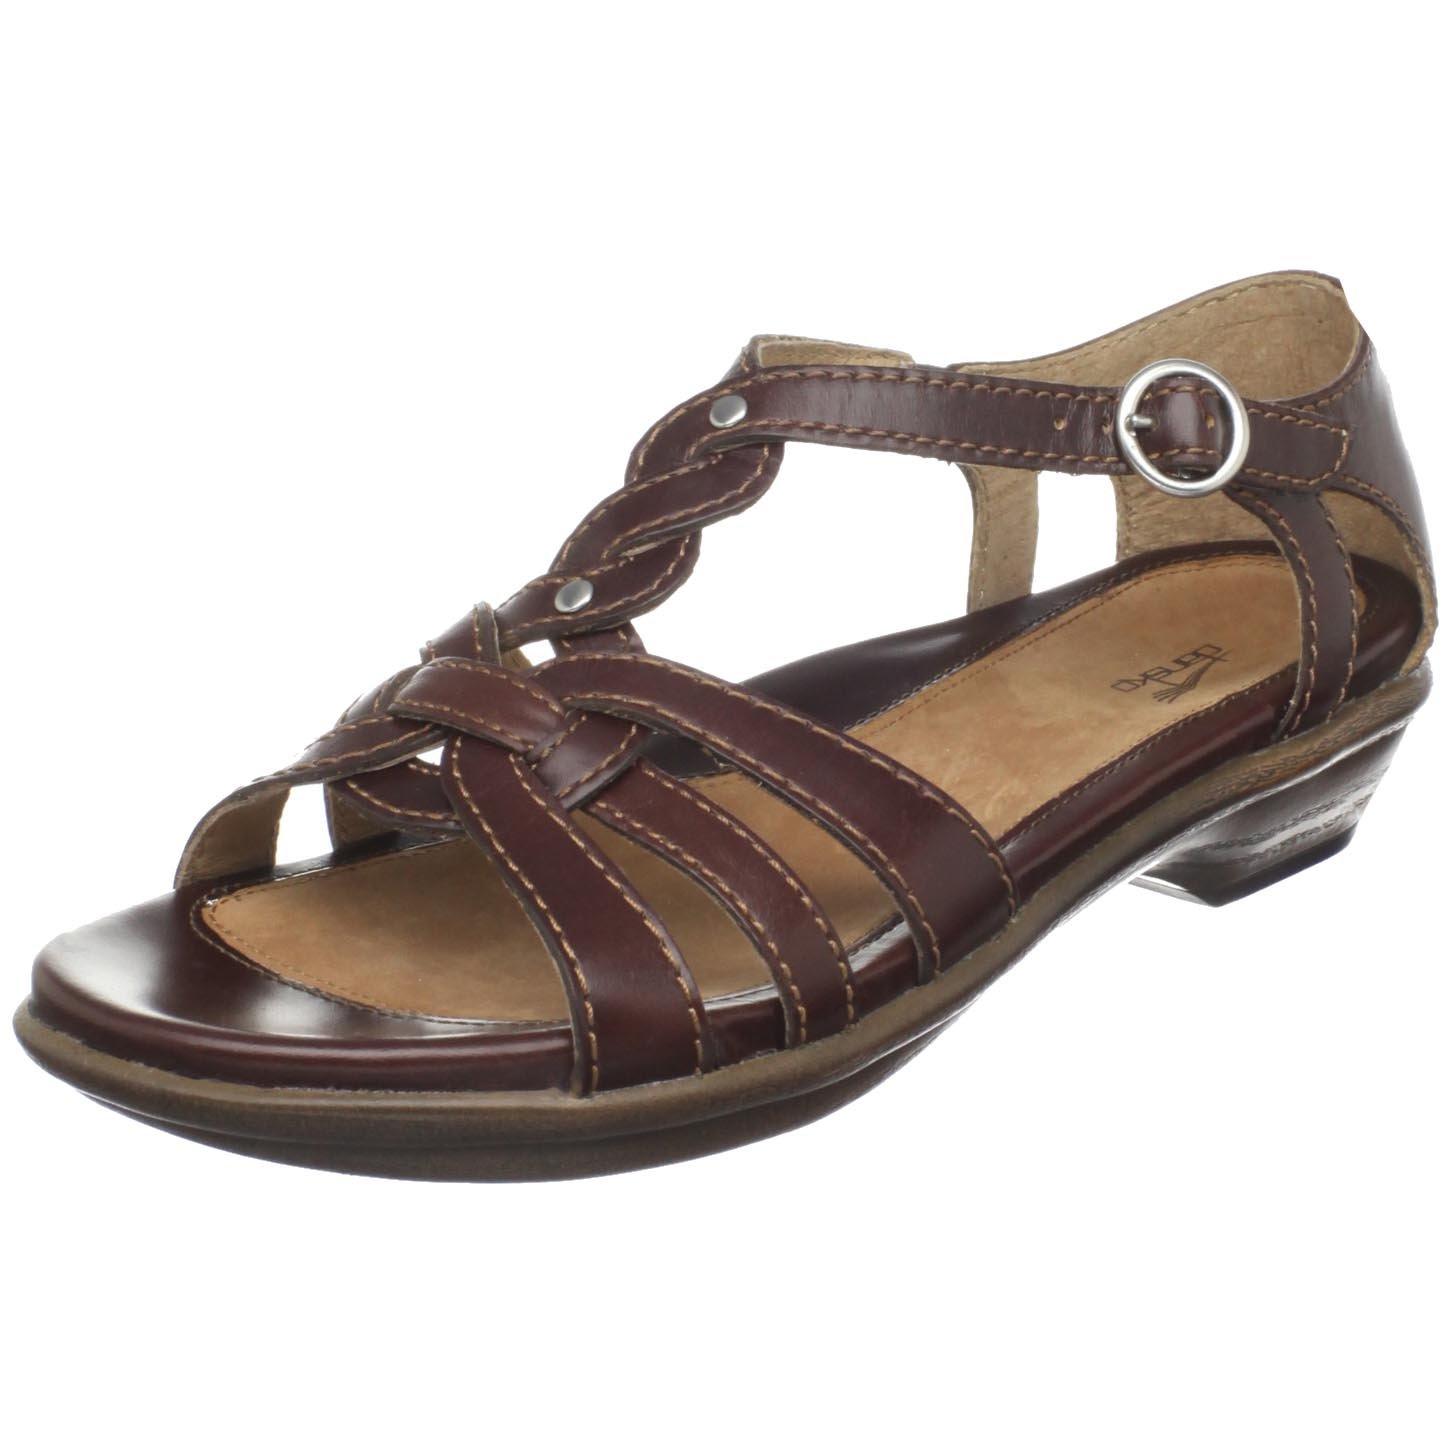 3abd10240290f Amazon.com | Dansko Women's Calliope Full Grain Sandal, Chocolate, 41 EU /  10.5-11 B(M) US | Sandals